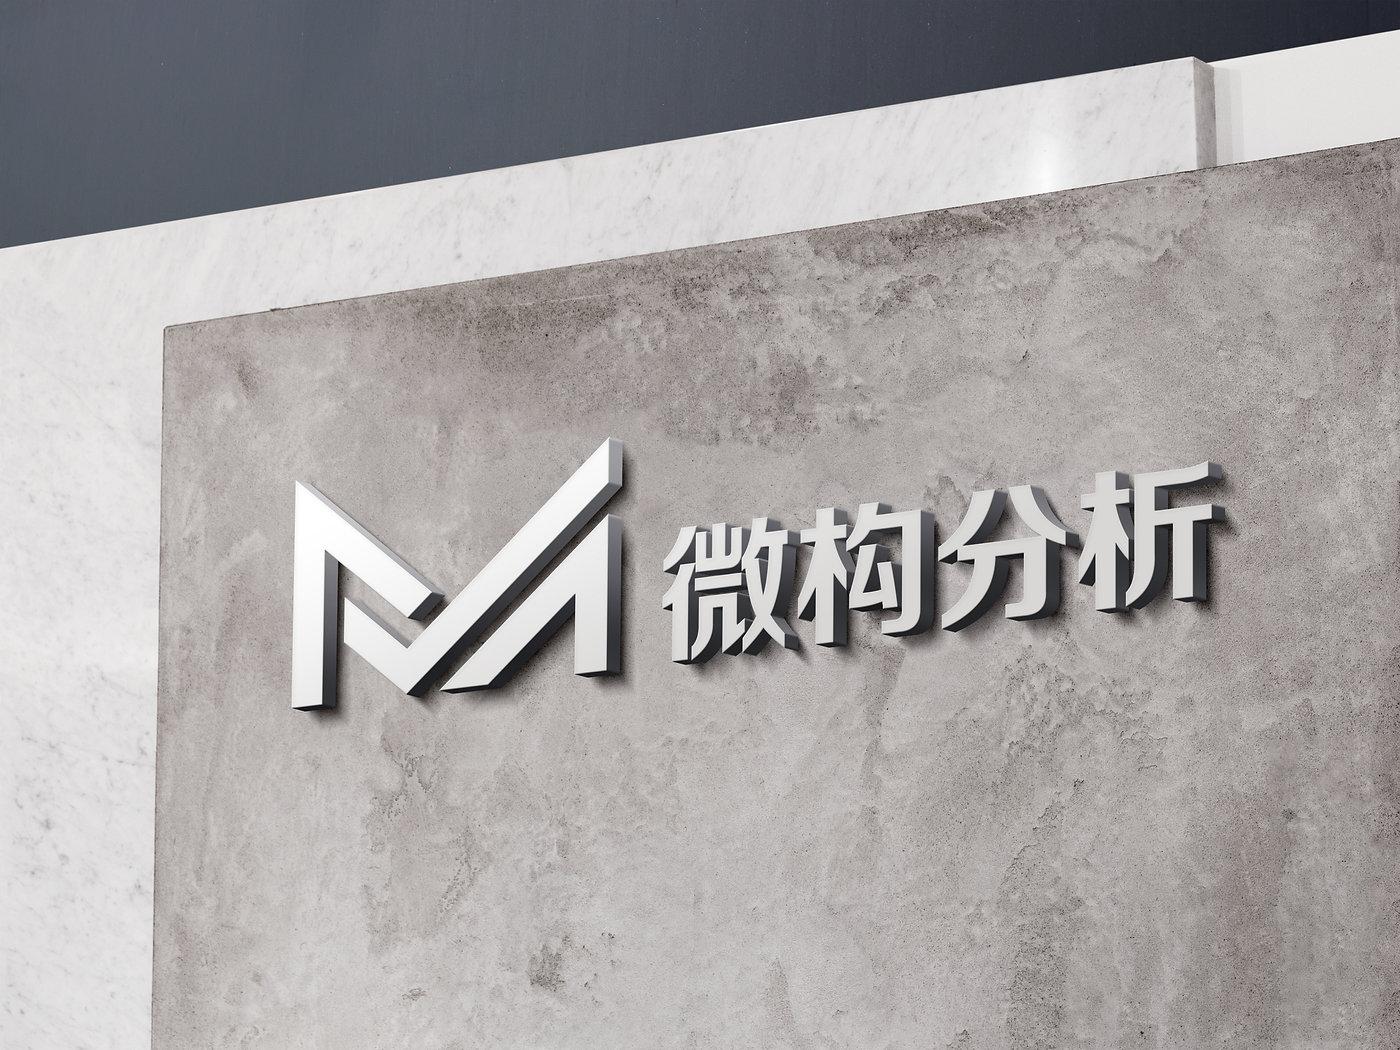 logo wall.jpg